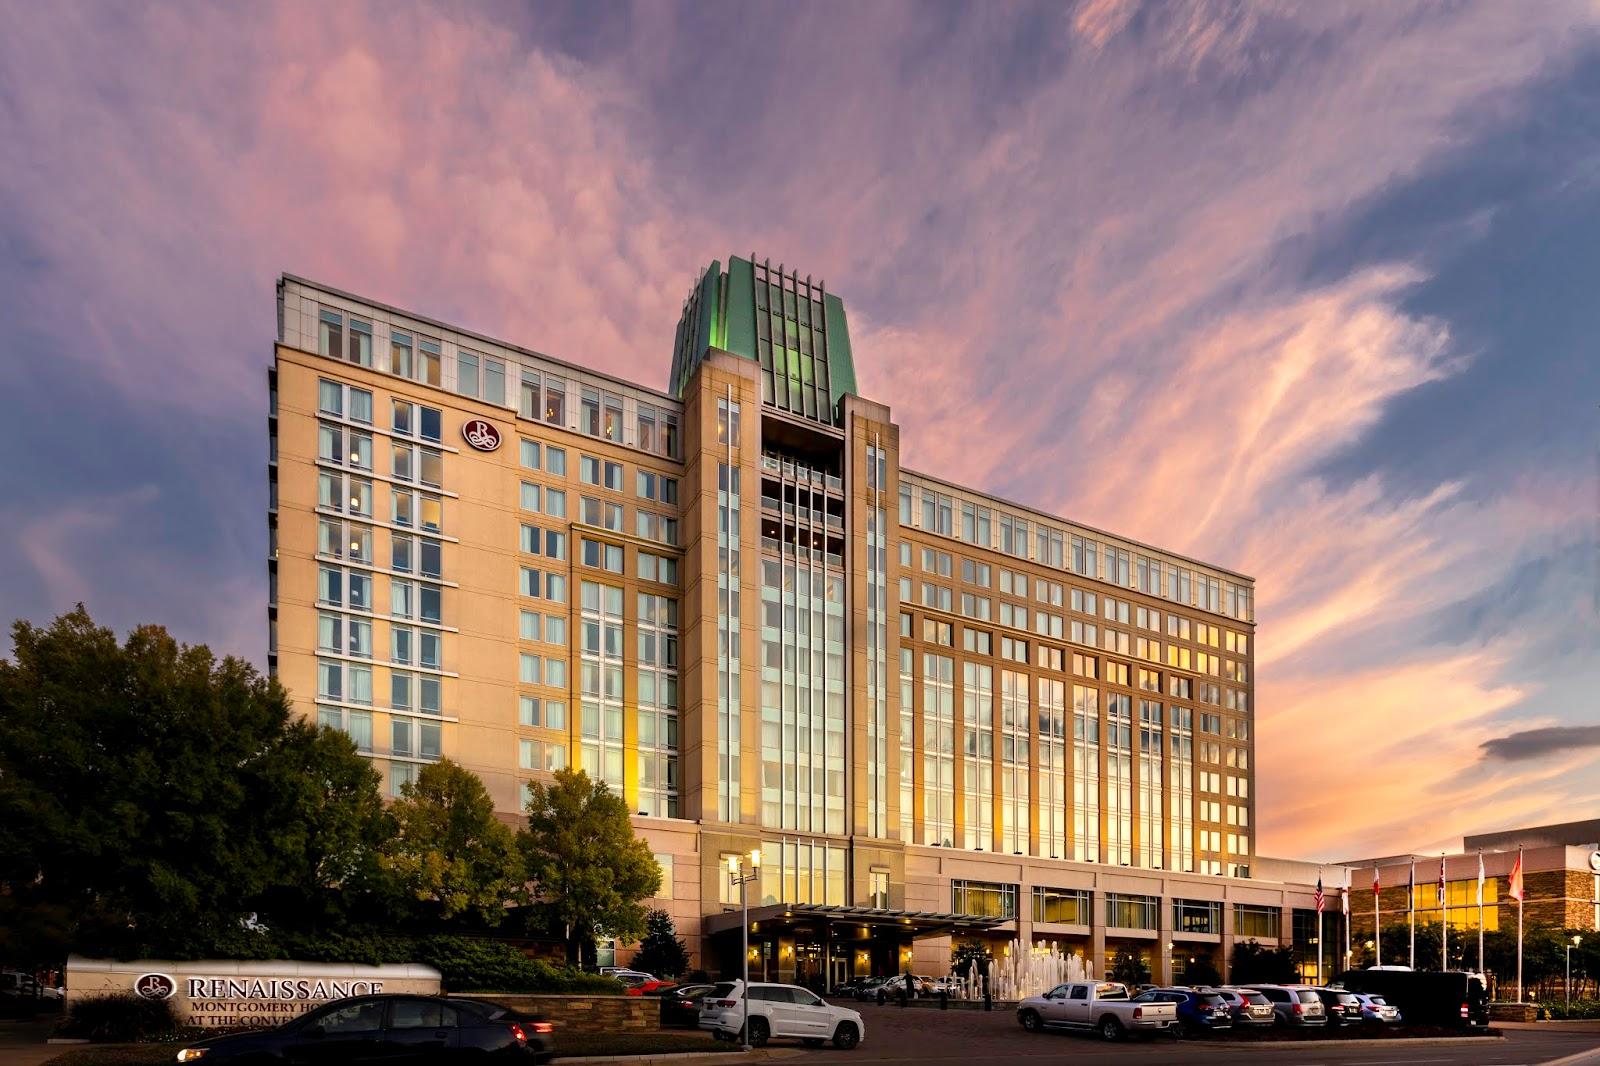 Renaissance Montgomery Hotel & Spa in Montgomery, Alabama